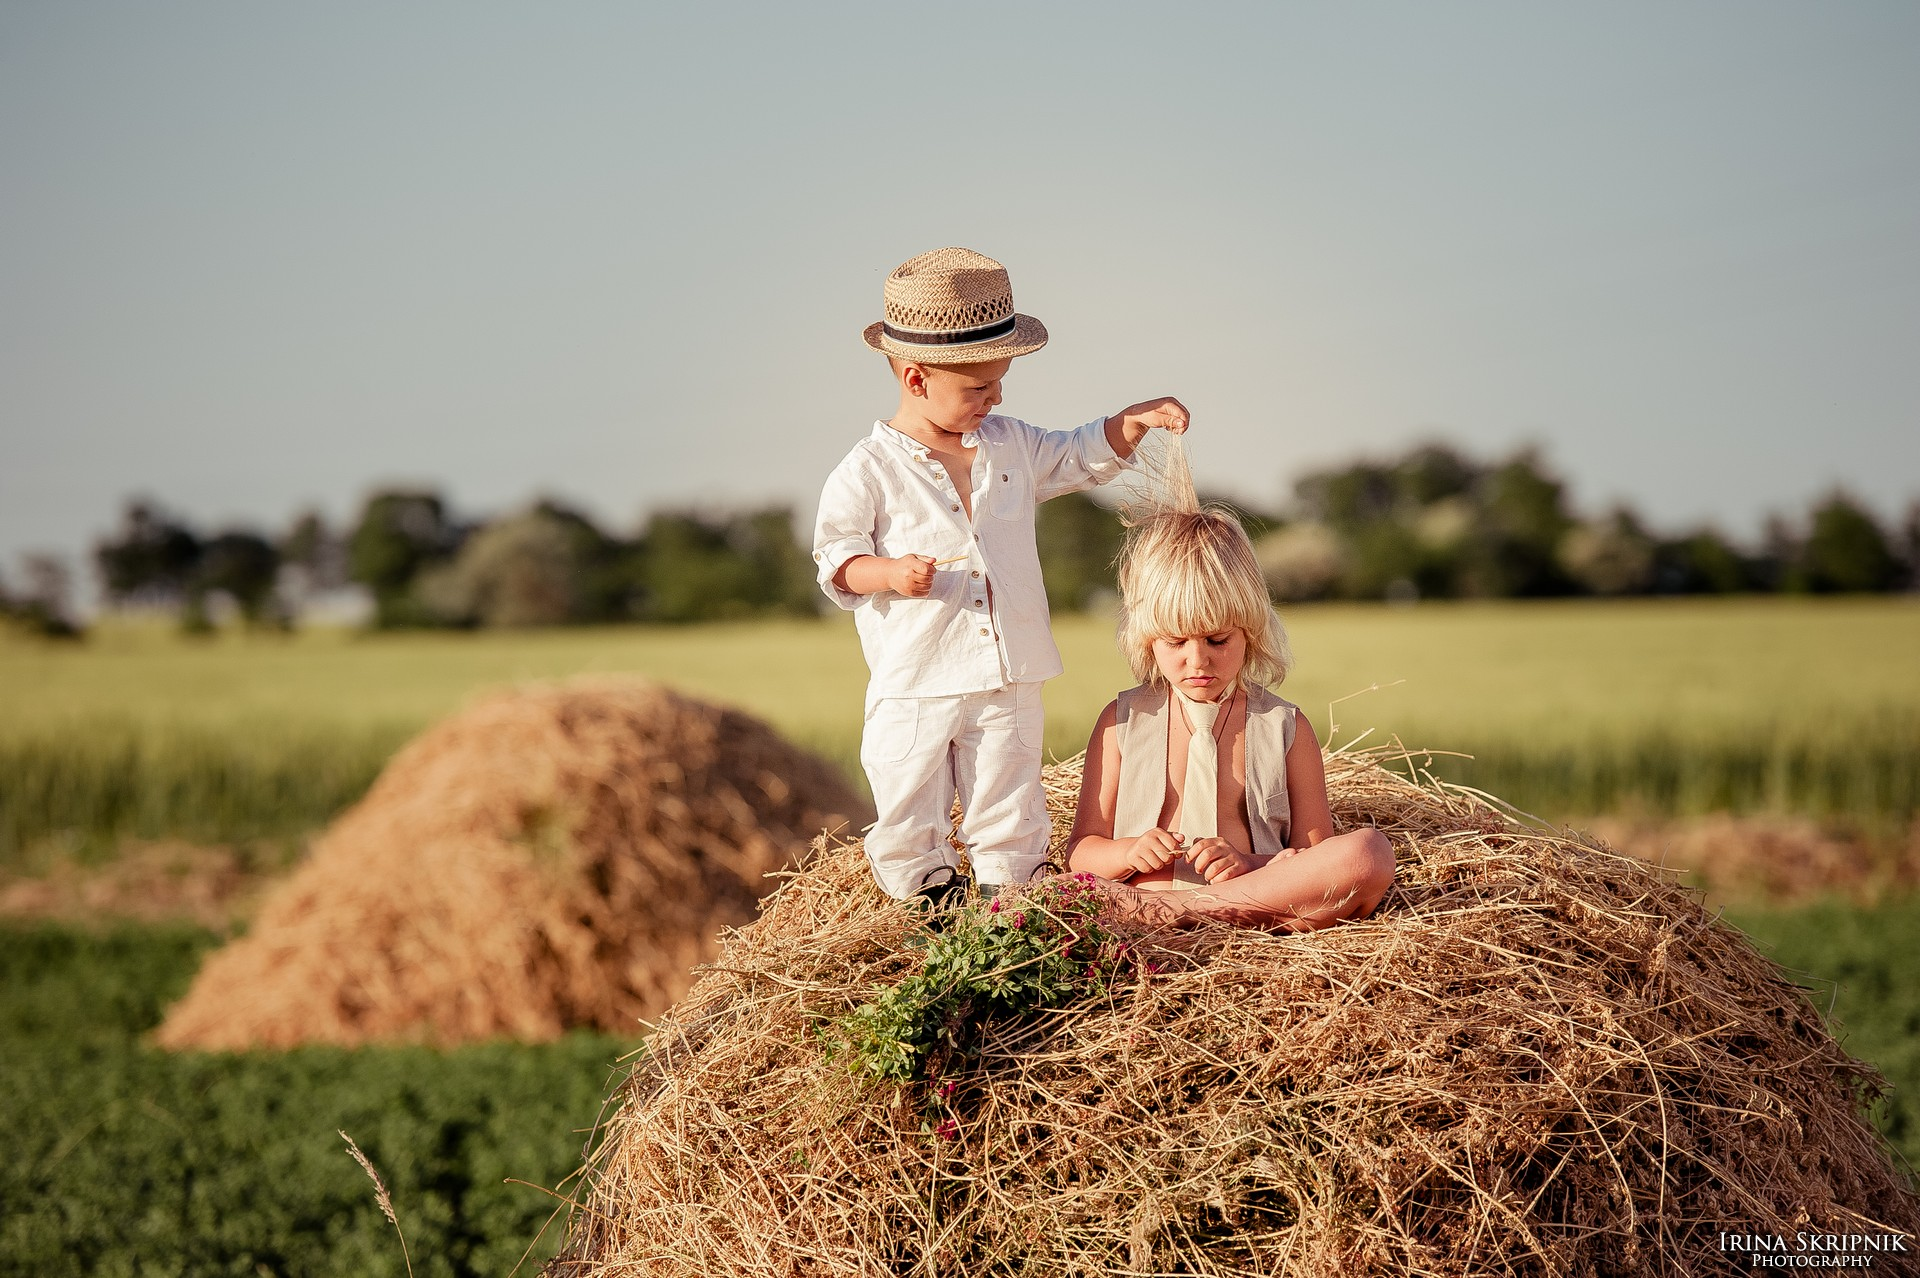 Irina Skripnik Photography 20120